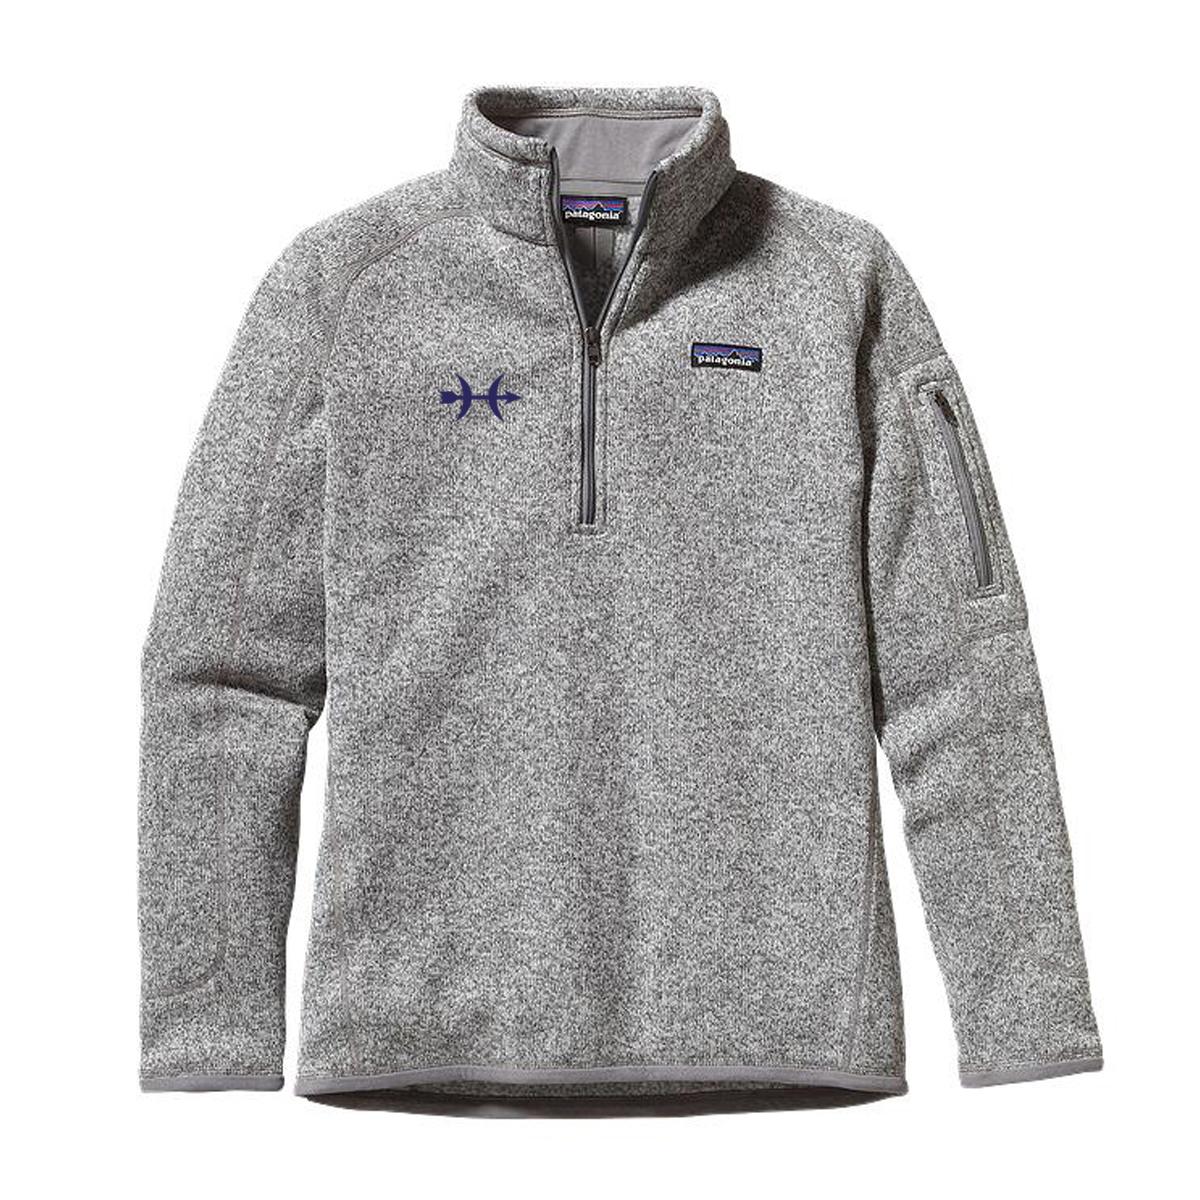 Hunt Yachts- Women's Patagonia Better Sweater 1/4 Zip